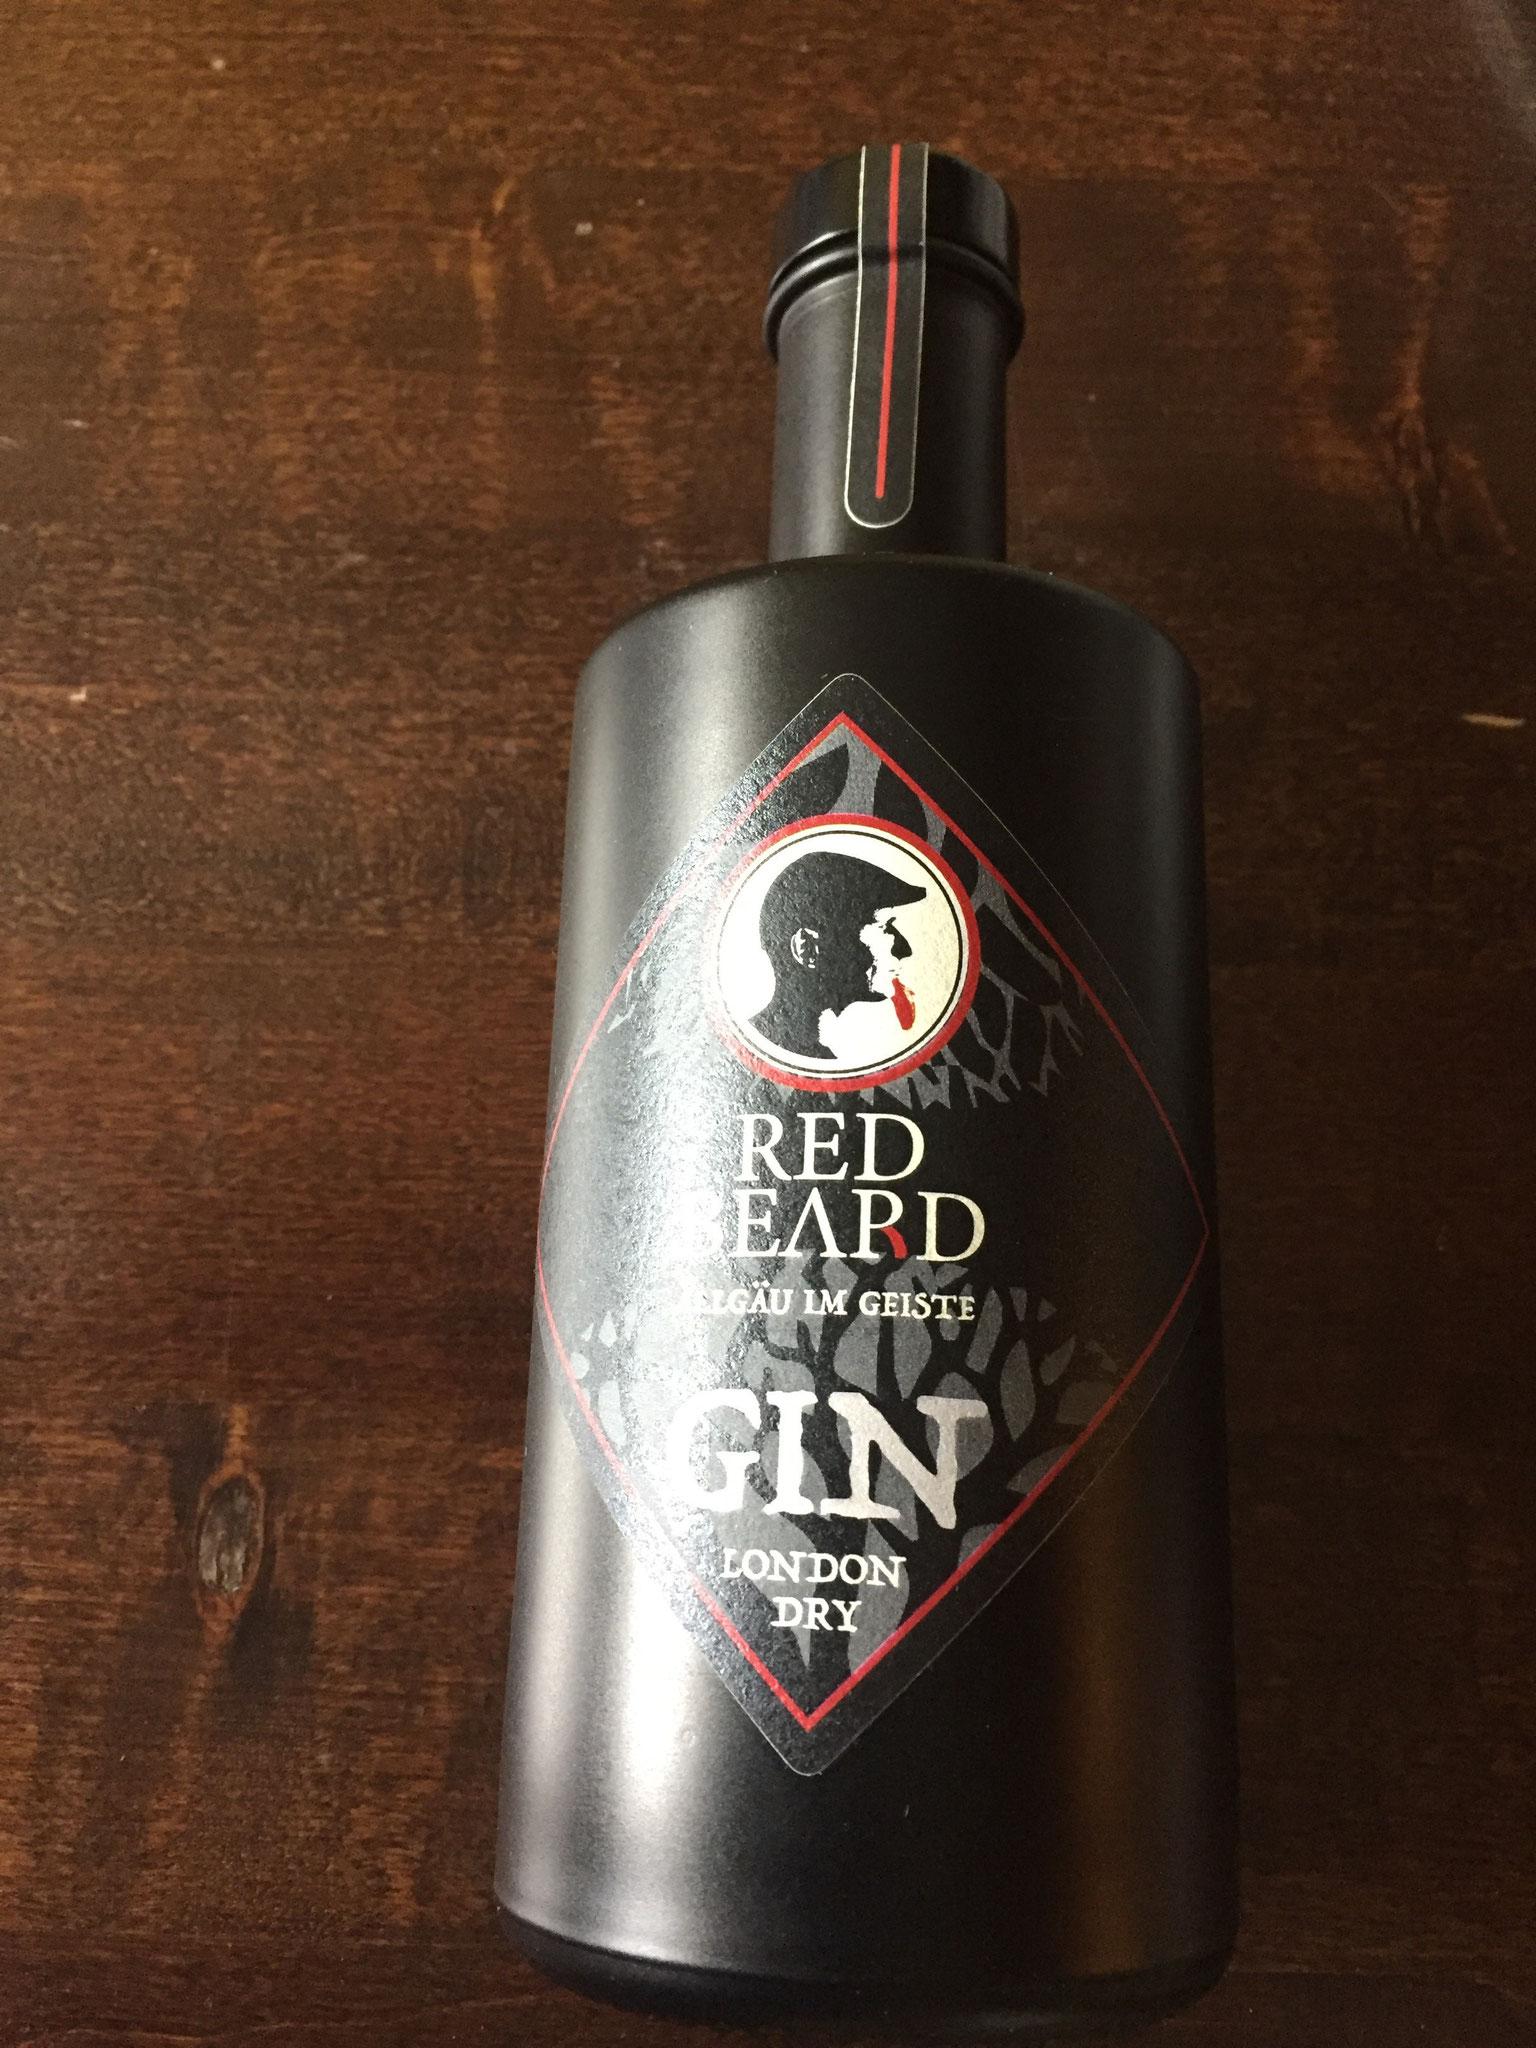 RED BEARD der Gin